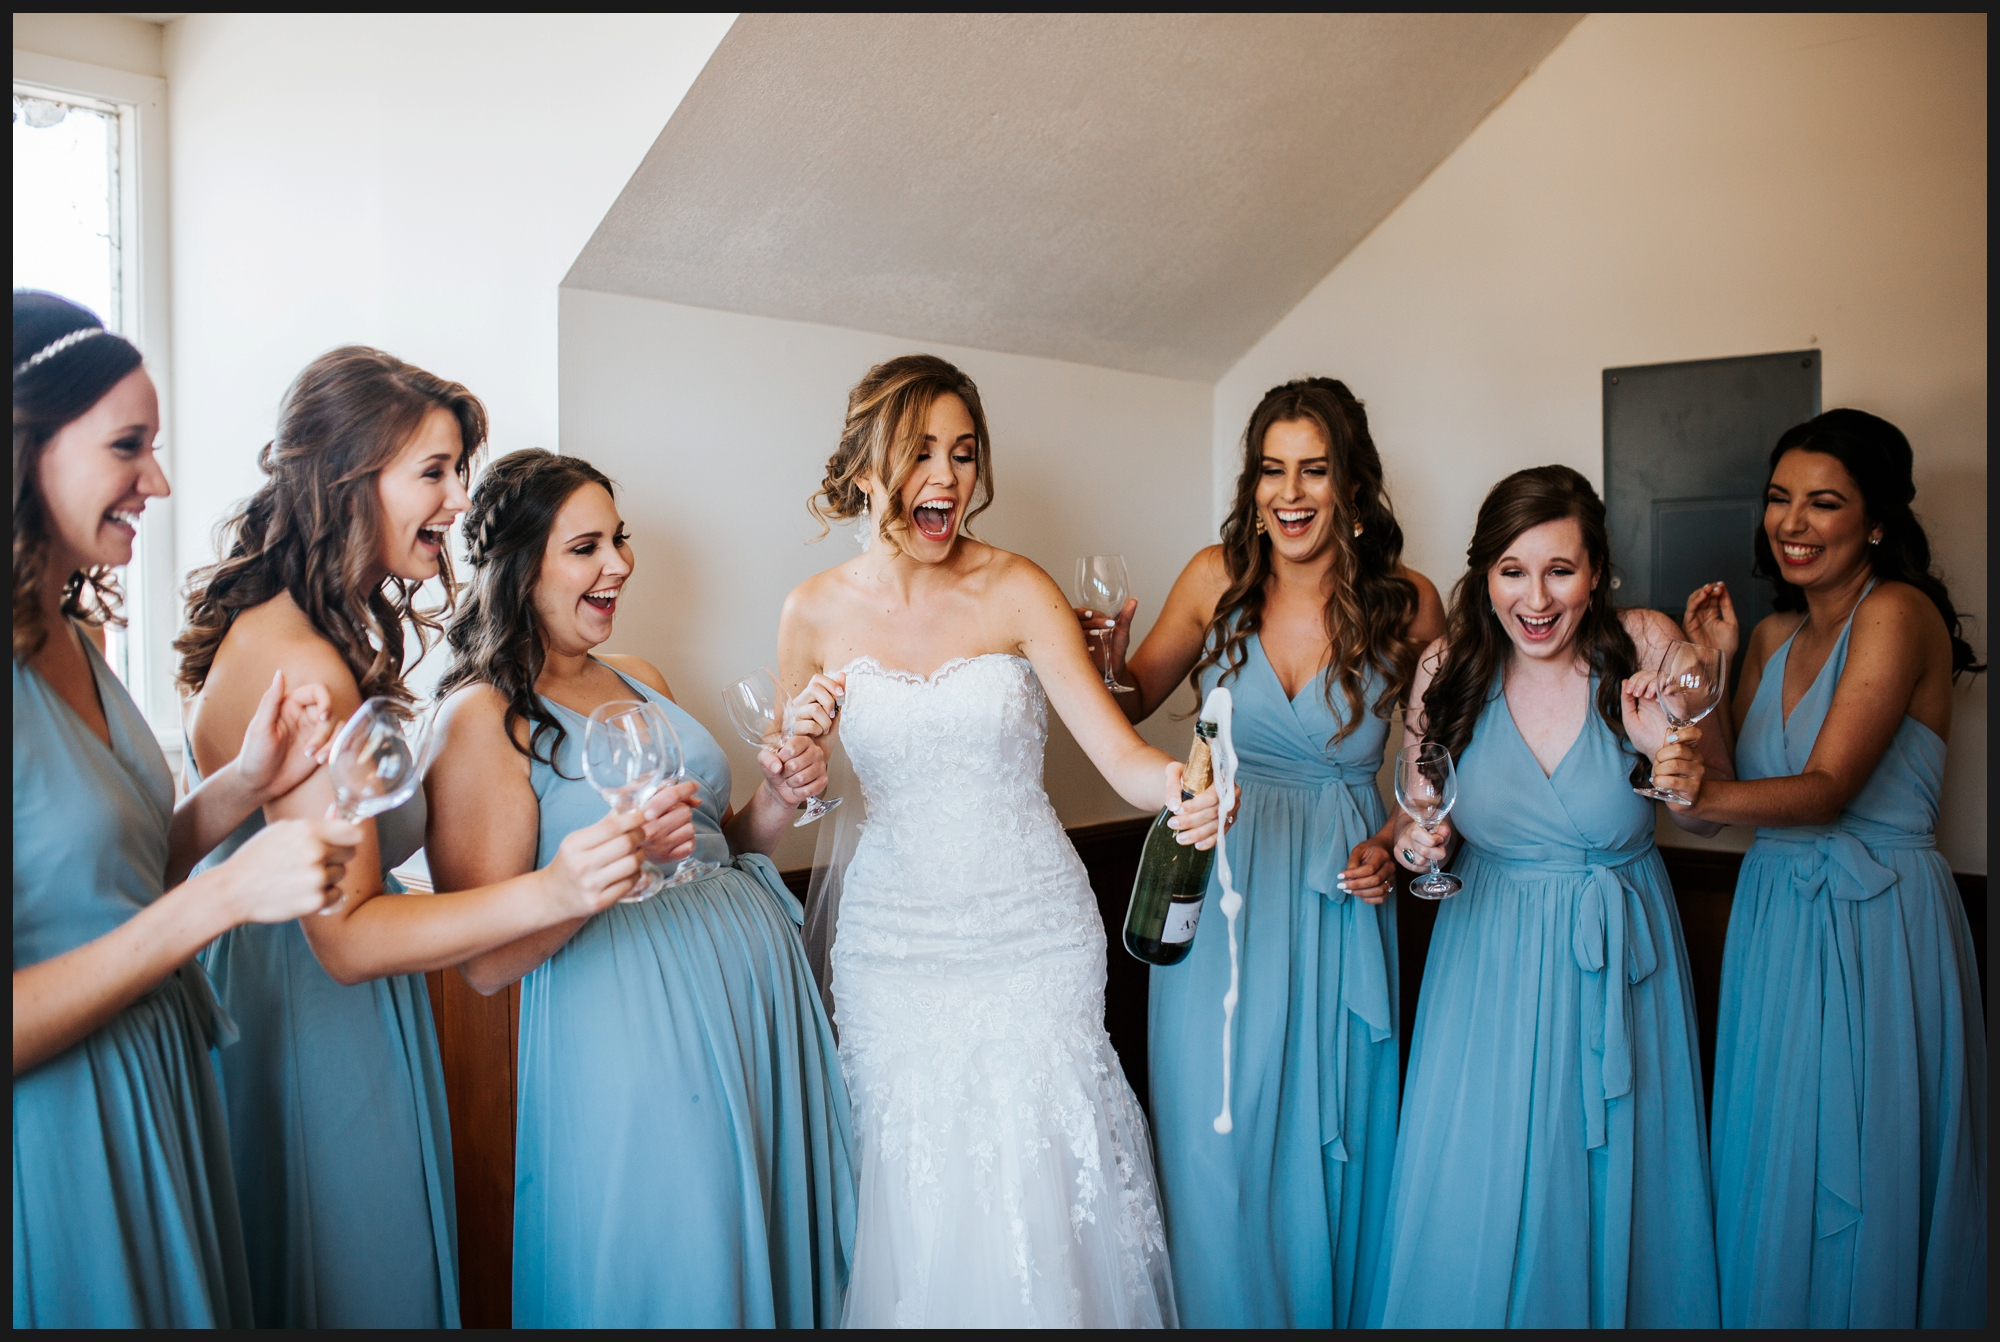 Orlando-Wedding-Photographer-destination-wedding-photographer-florida-wedding-photographer-bohemian-wedding-photographer_0058.jpg